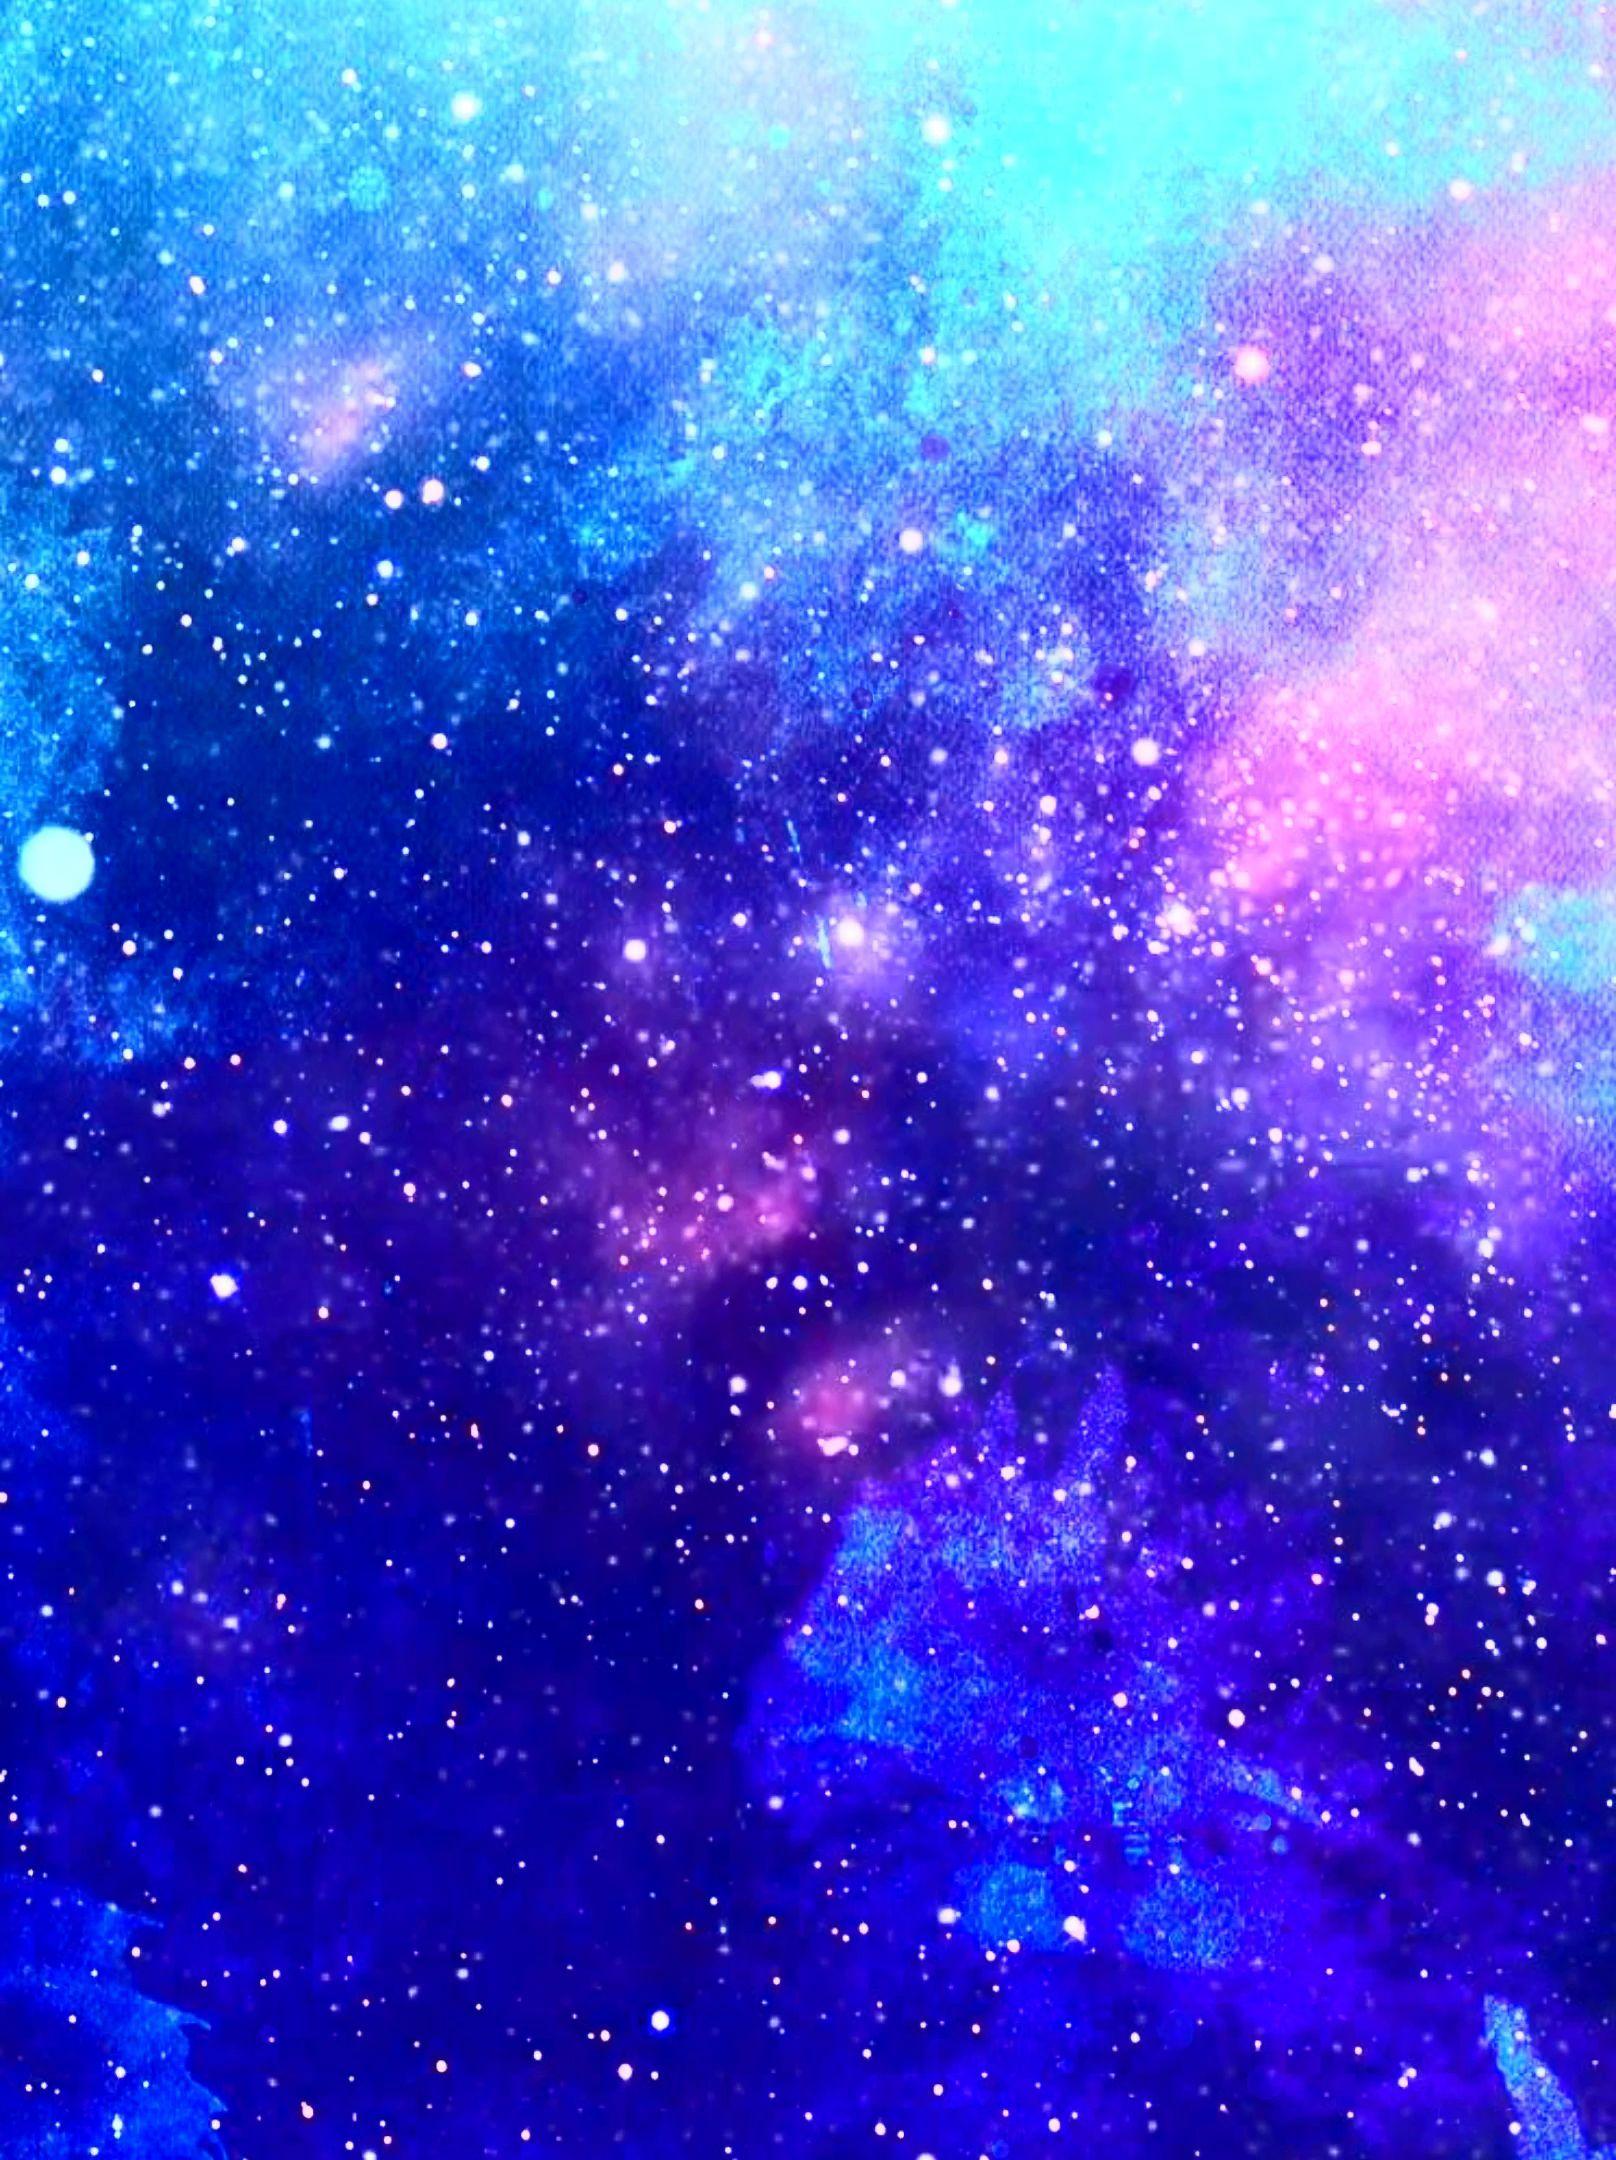 Galaxy Galaxy Phonewallpapervideos In 2020 Aesthetic Galaxy Galaxy Wallpaper Galaxy Phone Wallpaper